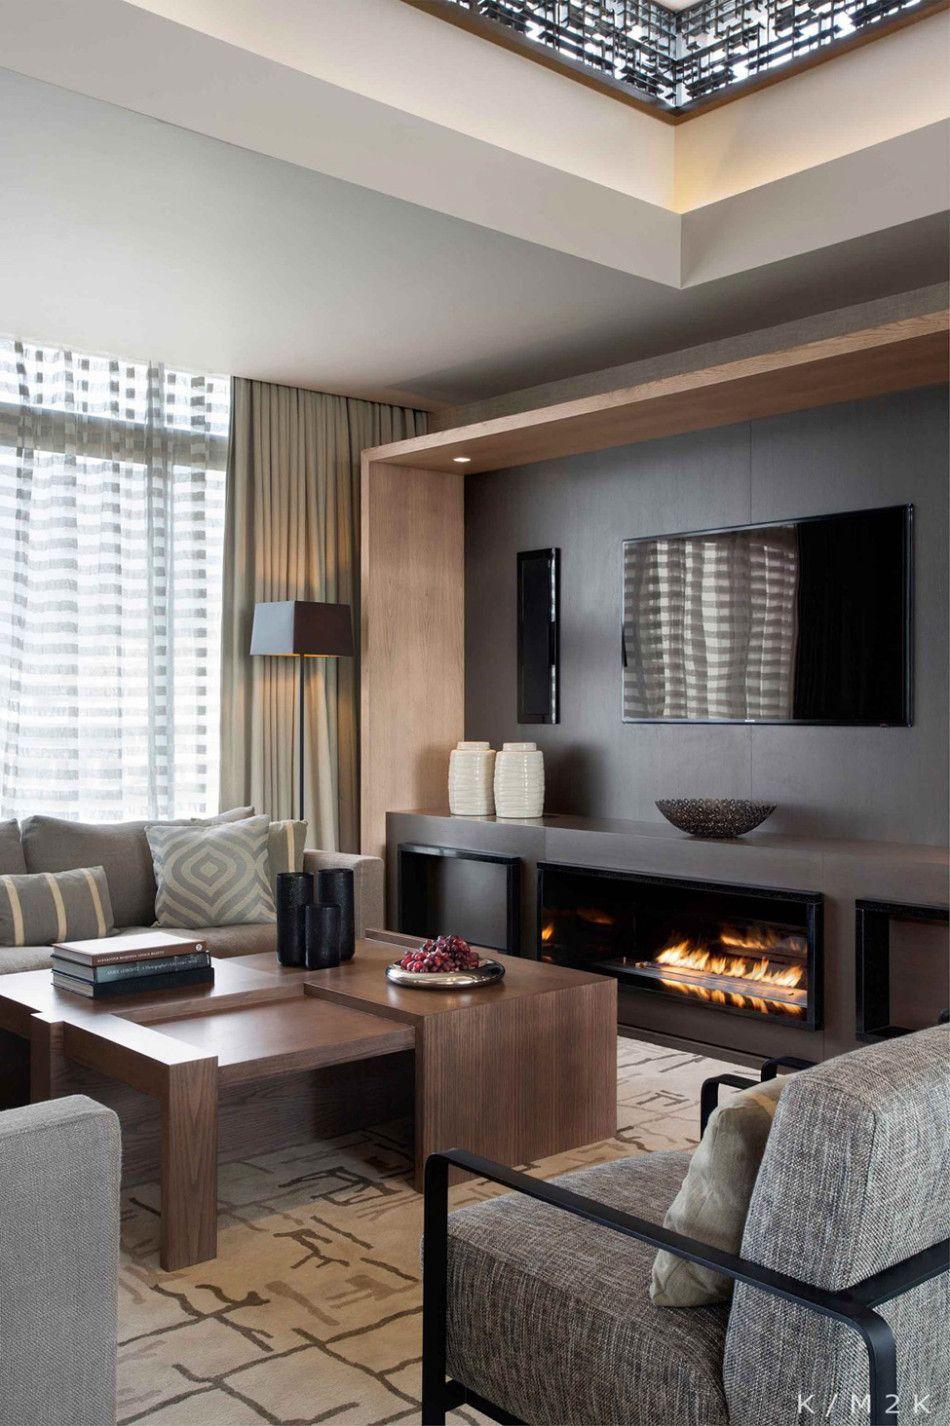 Living Room   Exquisite Design/detailing With A Melange Of Well Chosen Furnishings  U0026 Decor